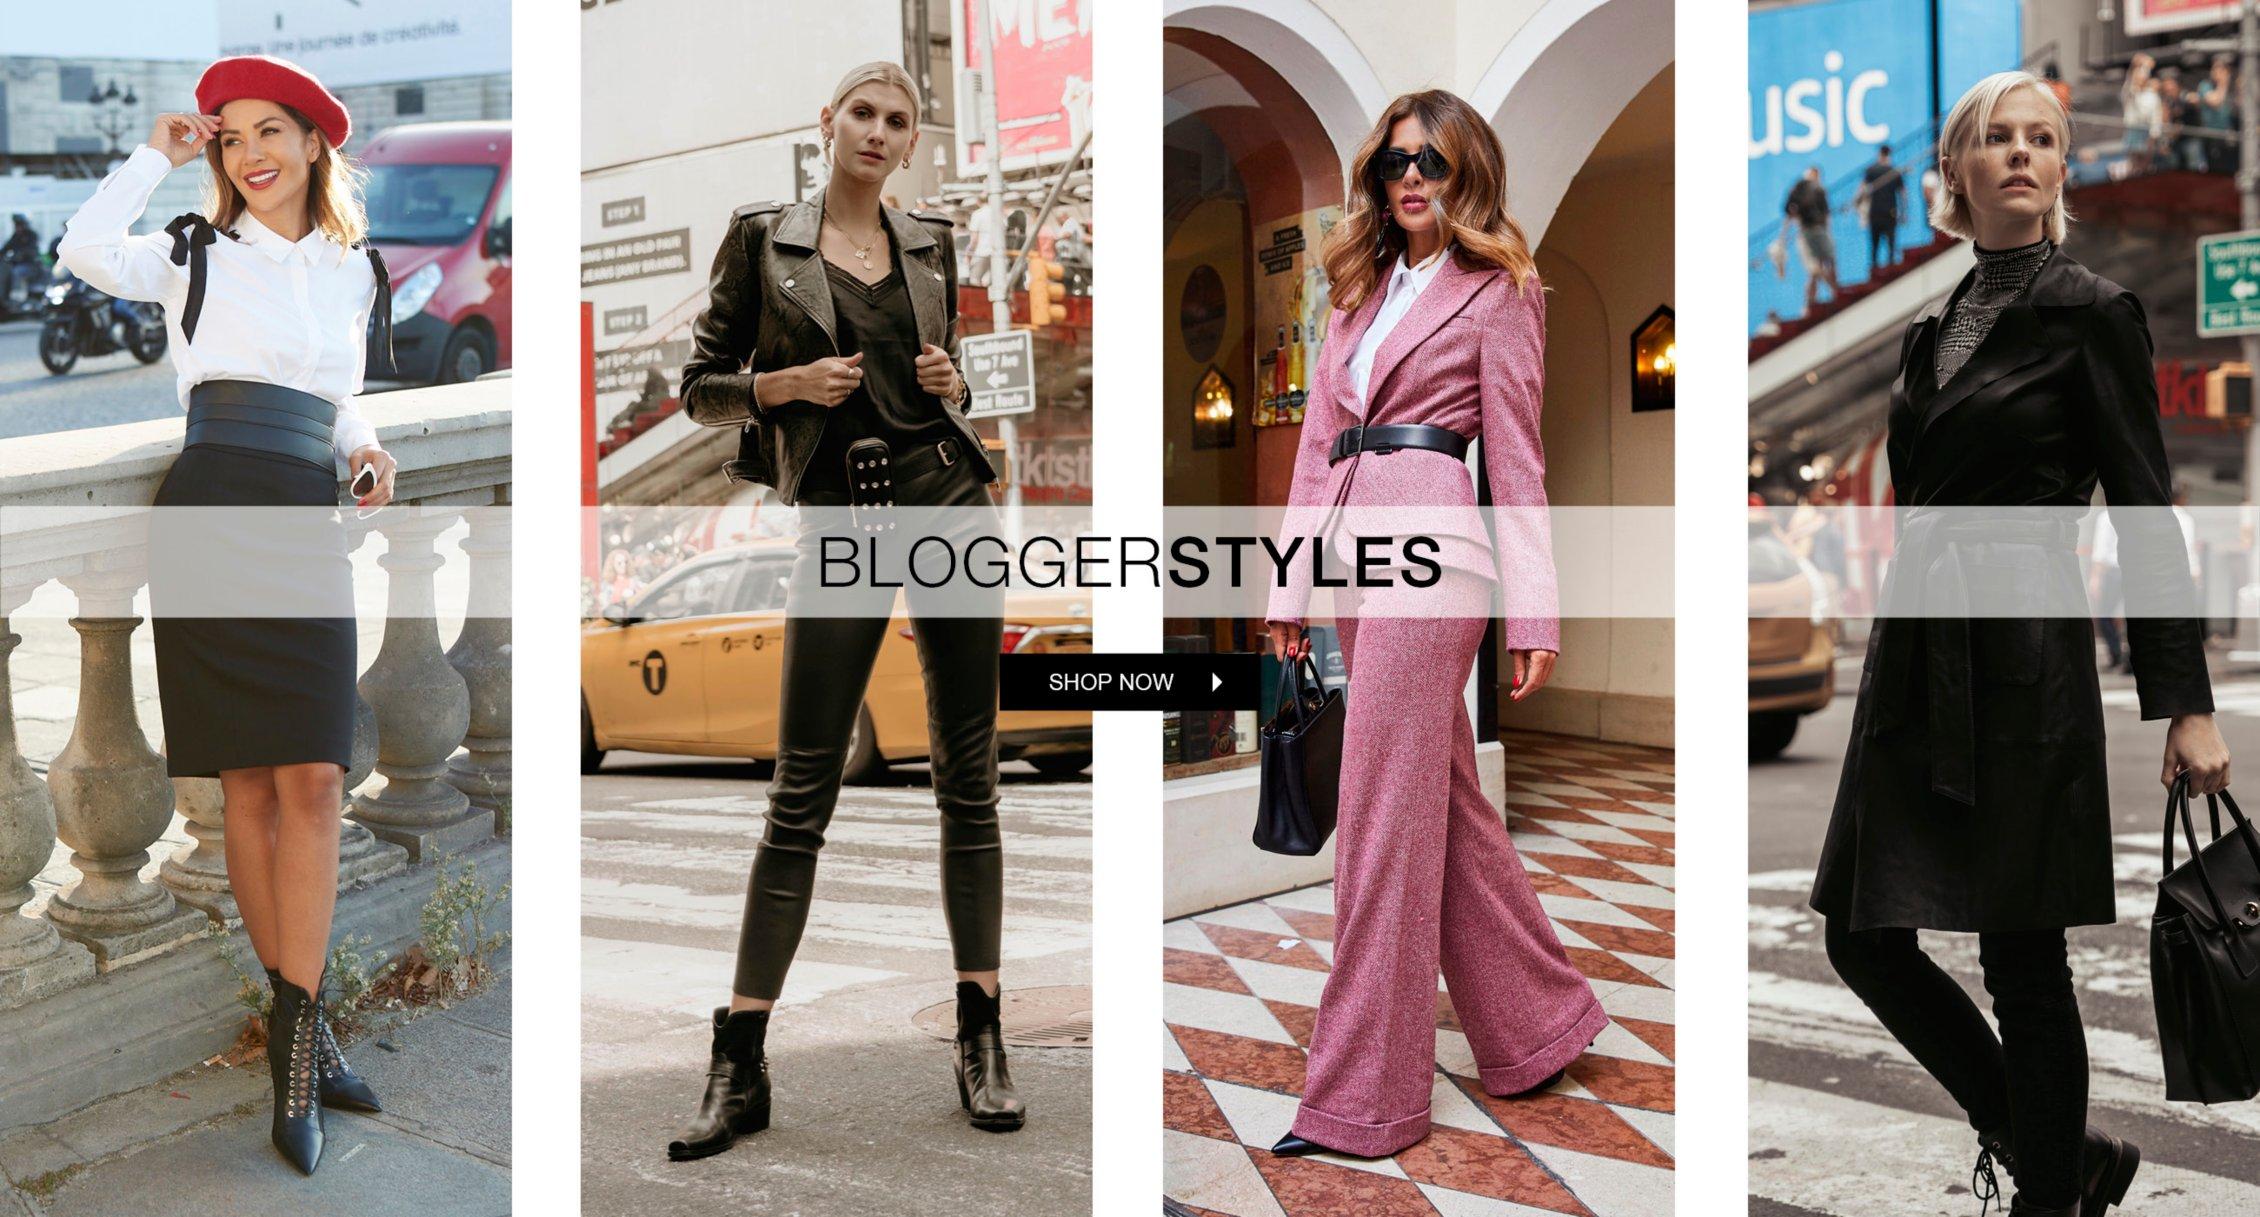 Bloggerstyles